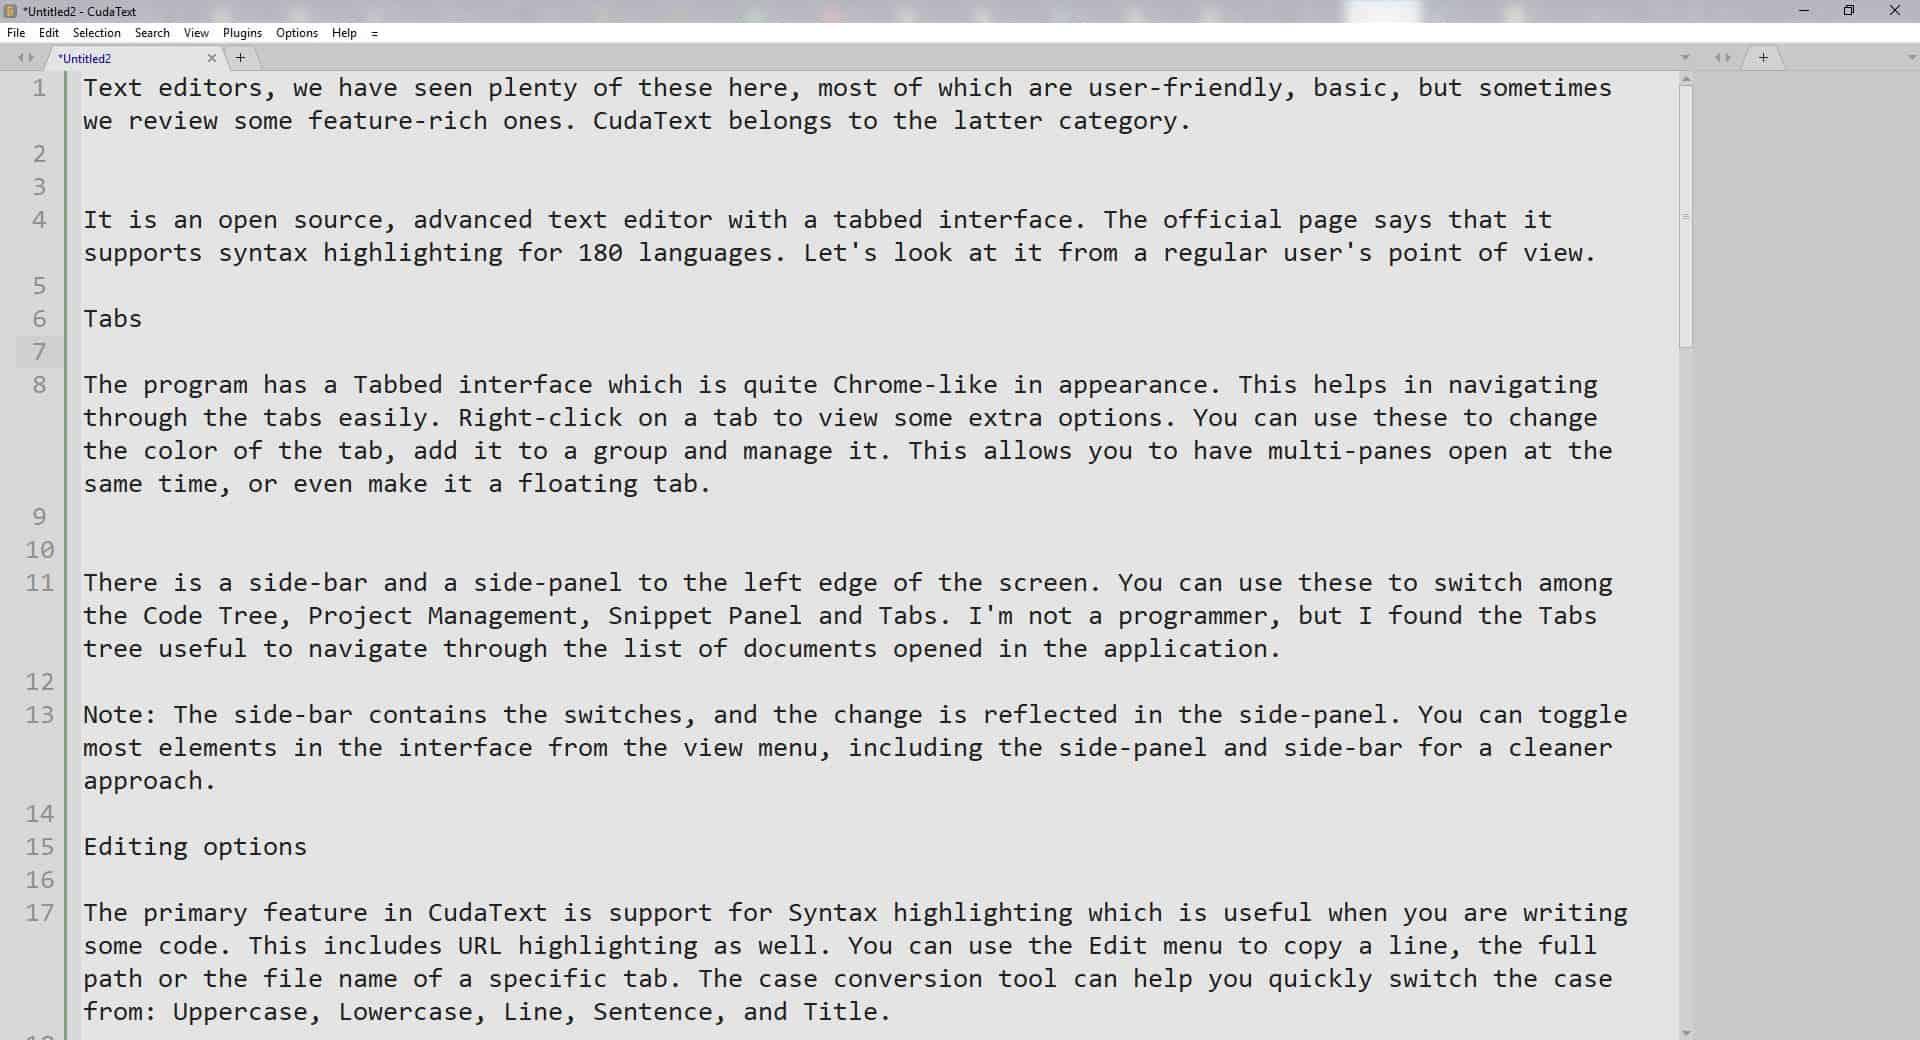 cudatext document